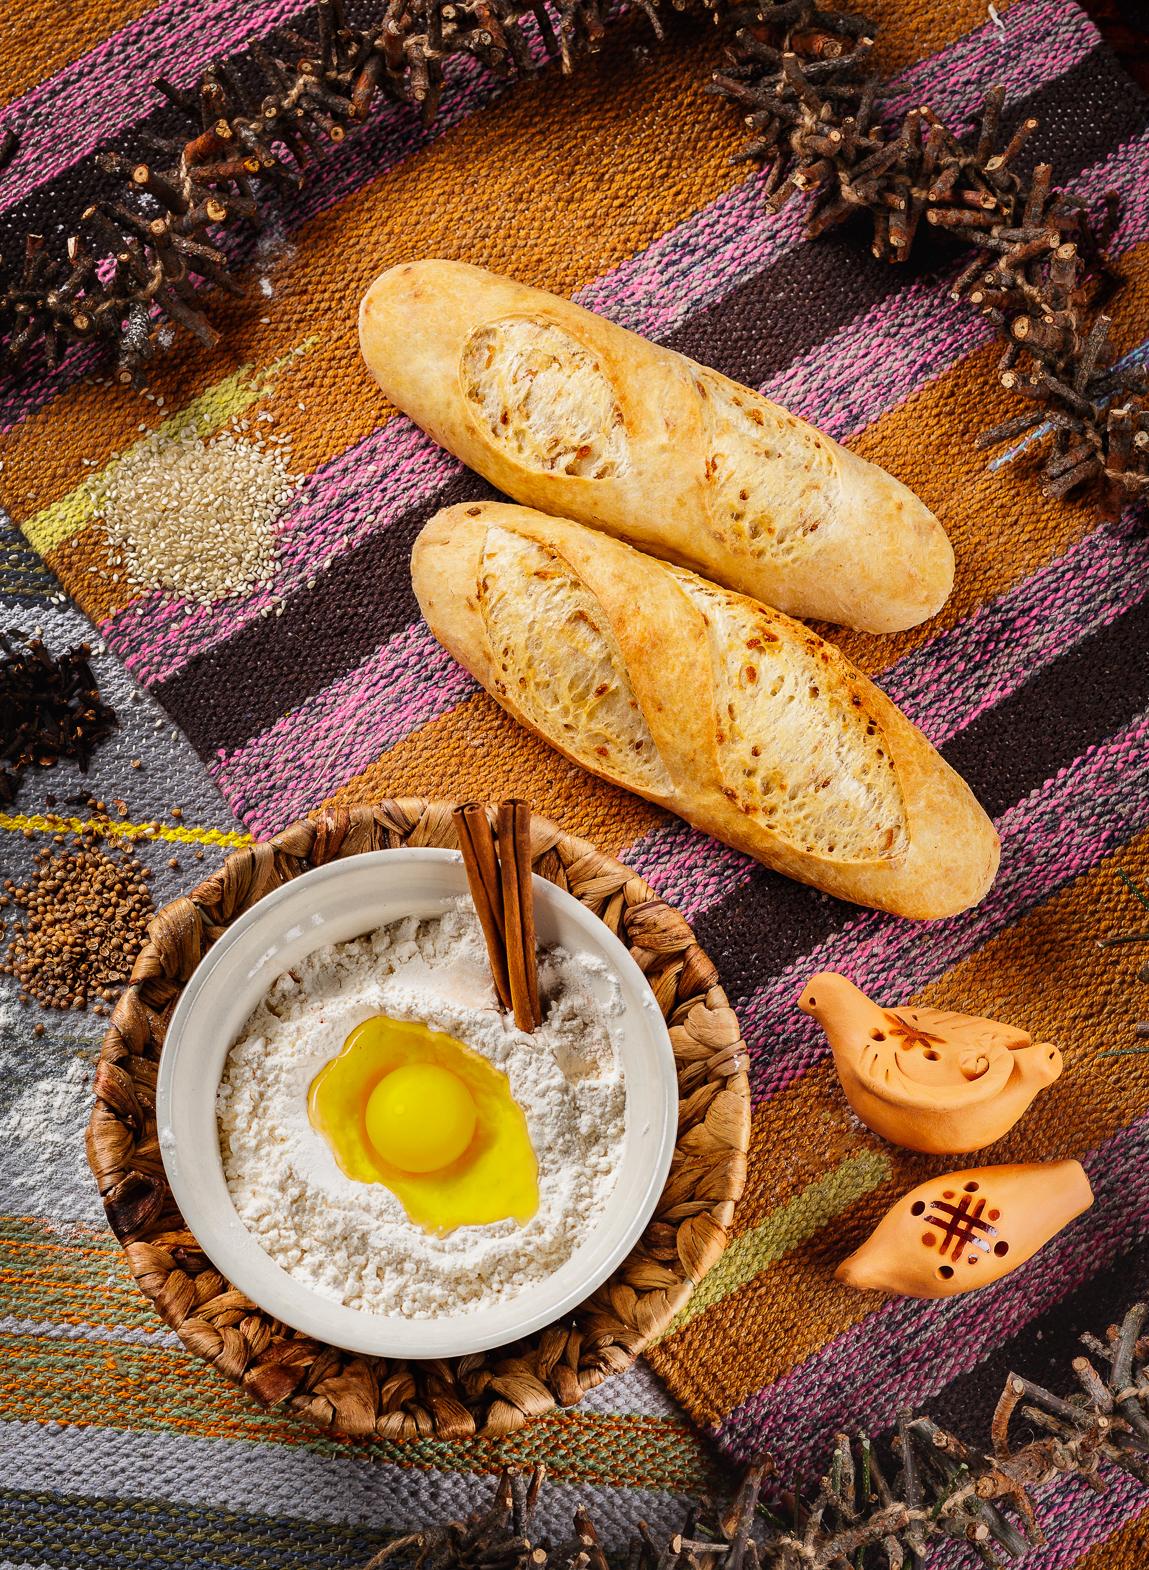 Фуд-фото хлеба, выпечки.